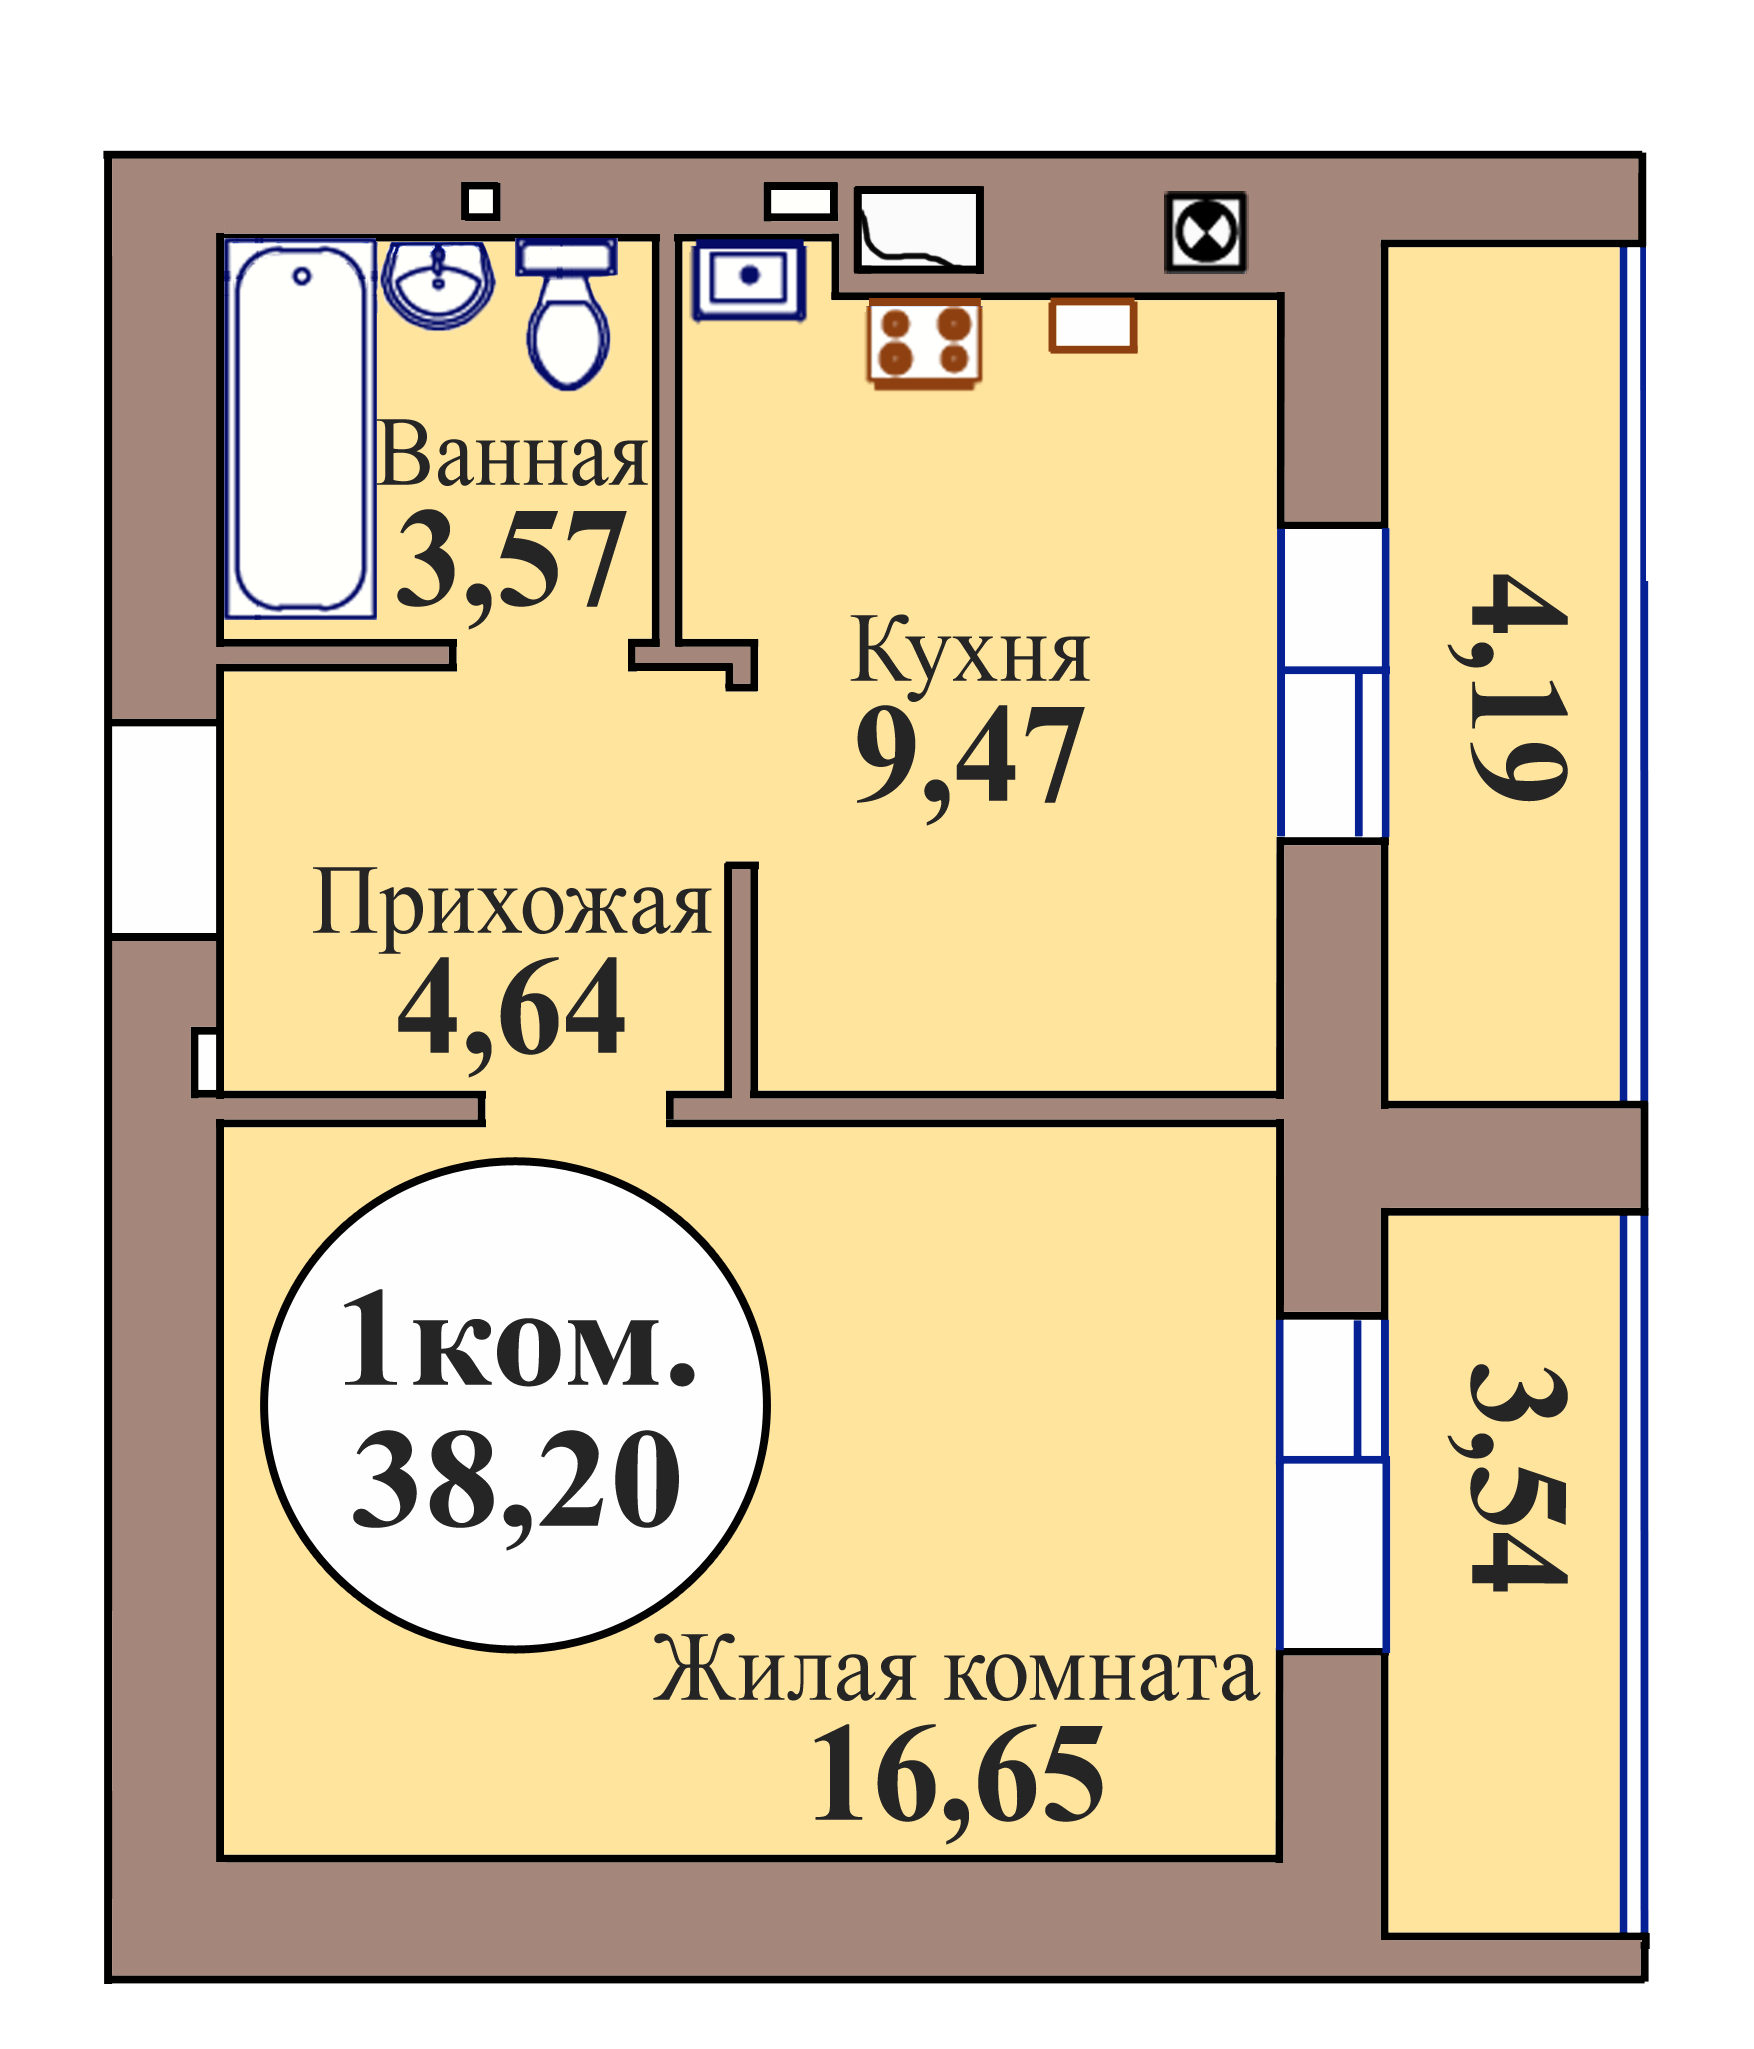 1-комн. кв. по пер. Калининградский, 5 кв. 9 в Калининграде